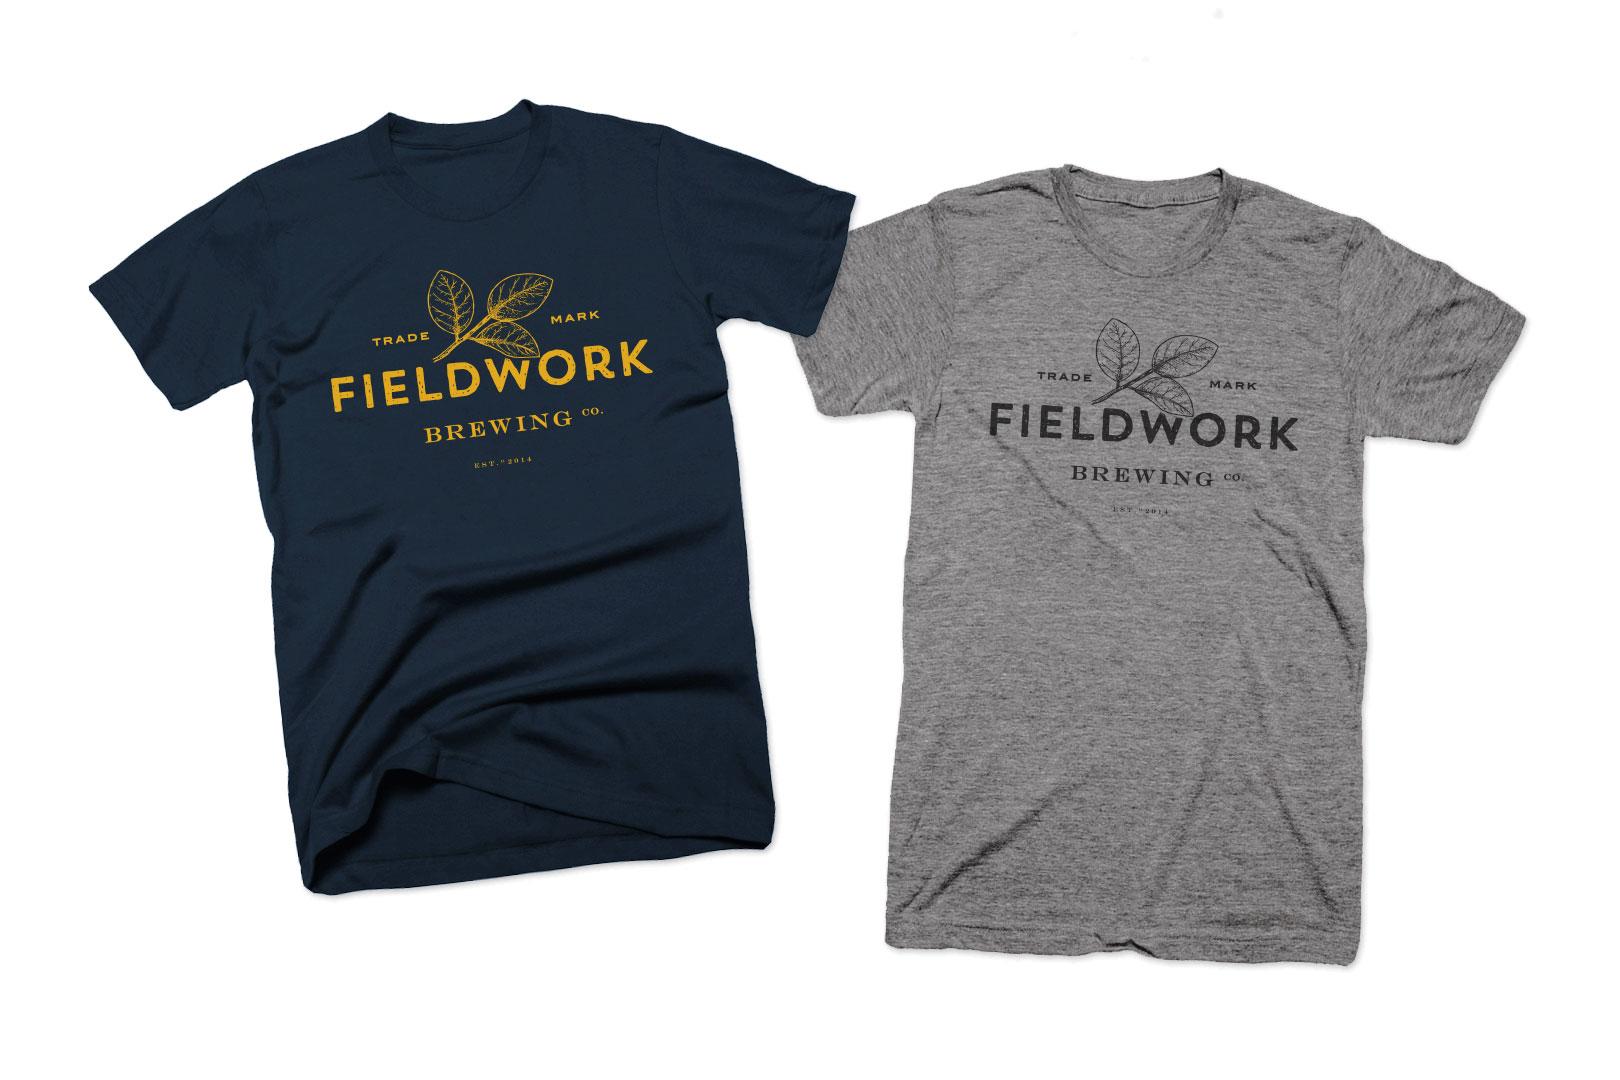 fieldwork-shirts